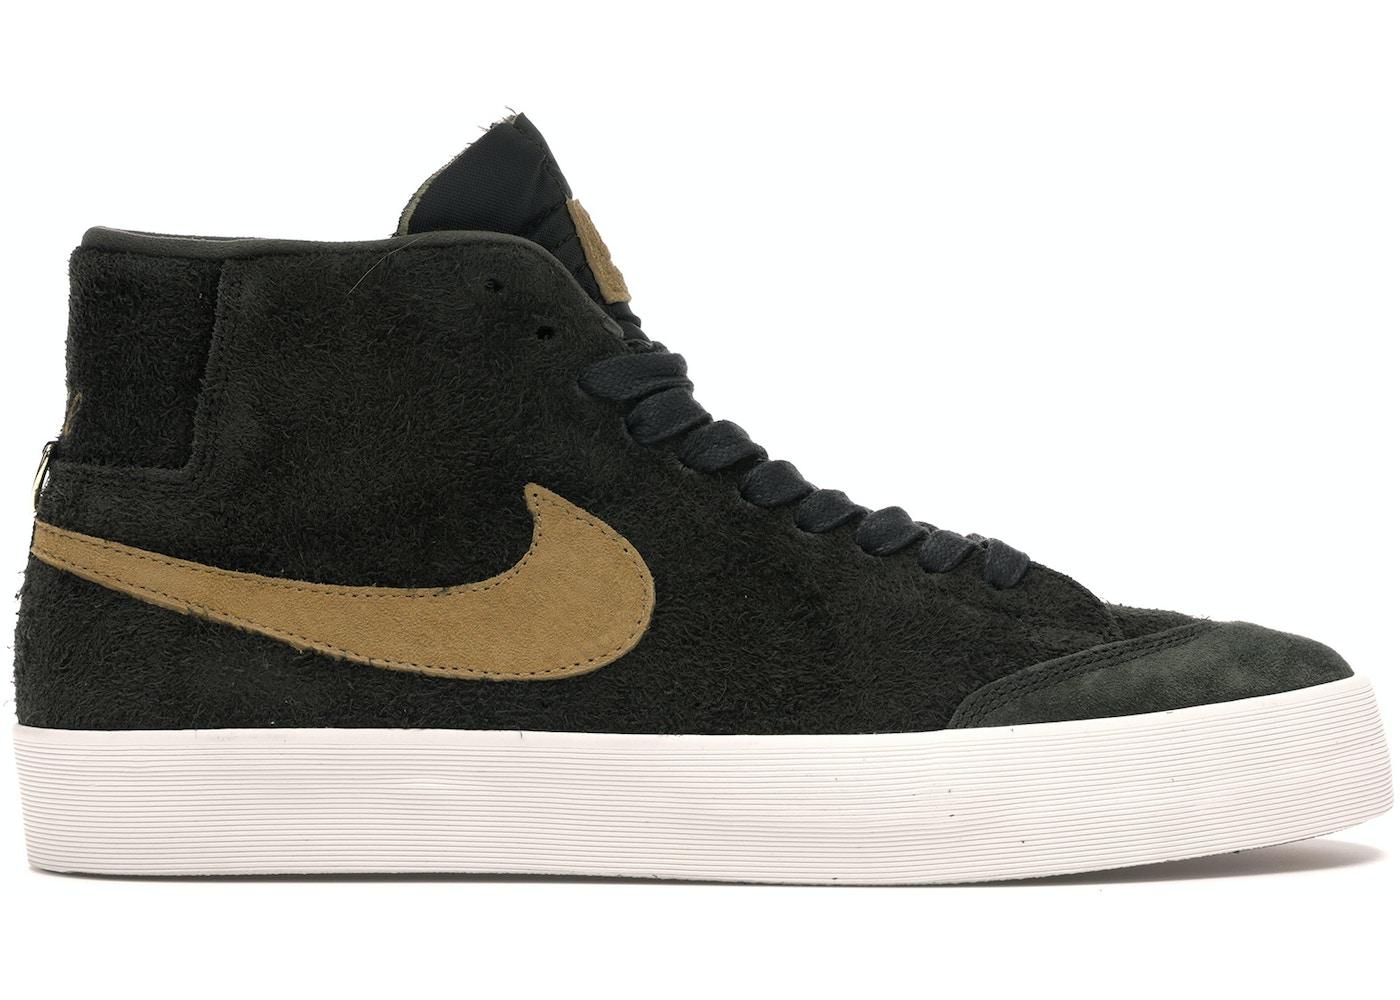 sale retailer f1926 34022 Nike SB Blazer Mid We Club 58